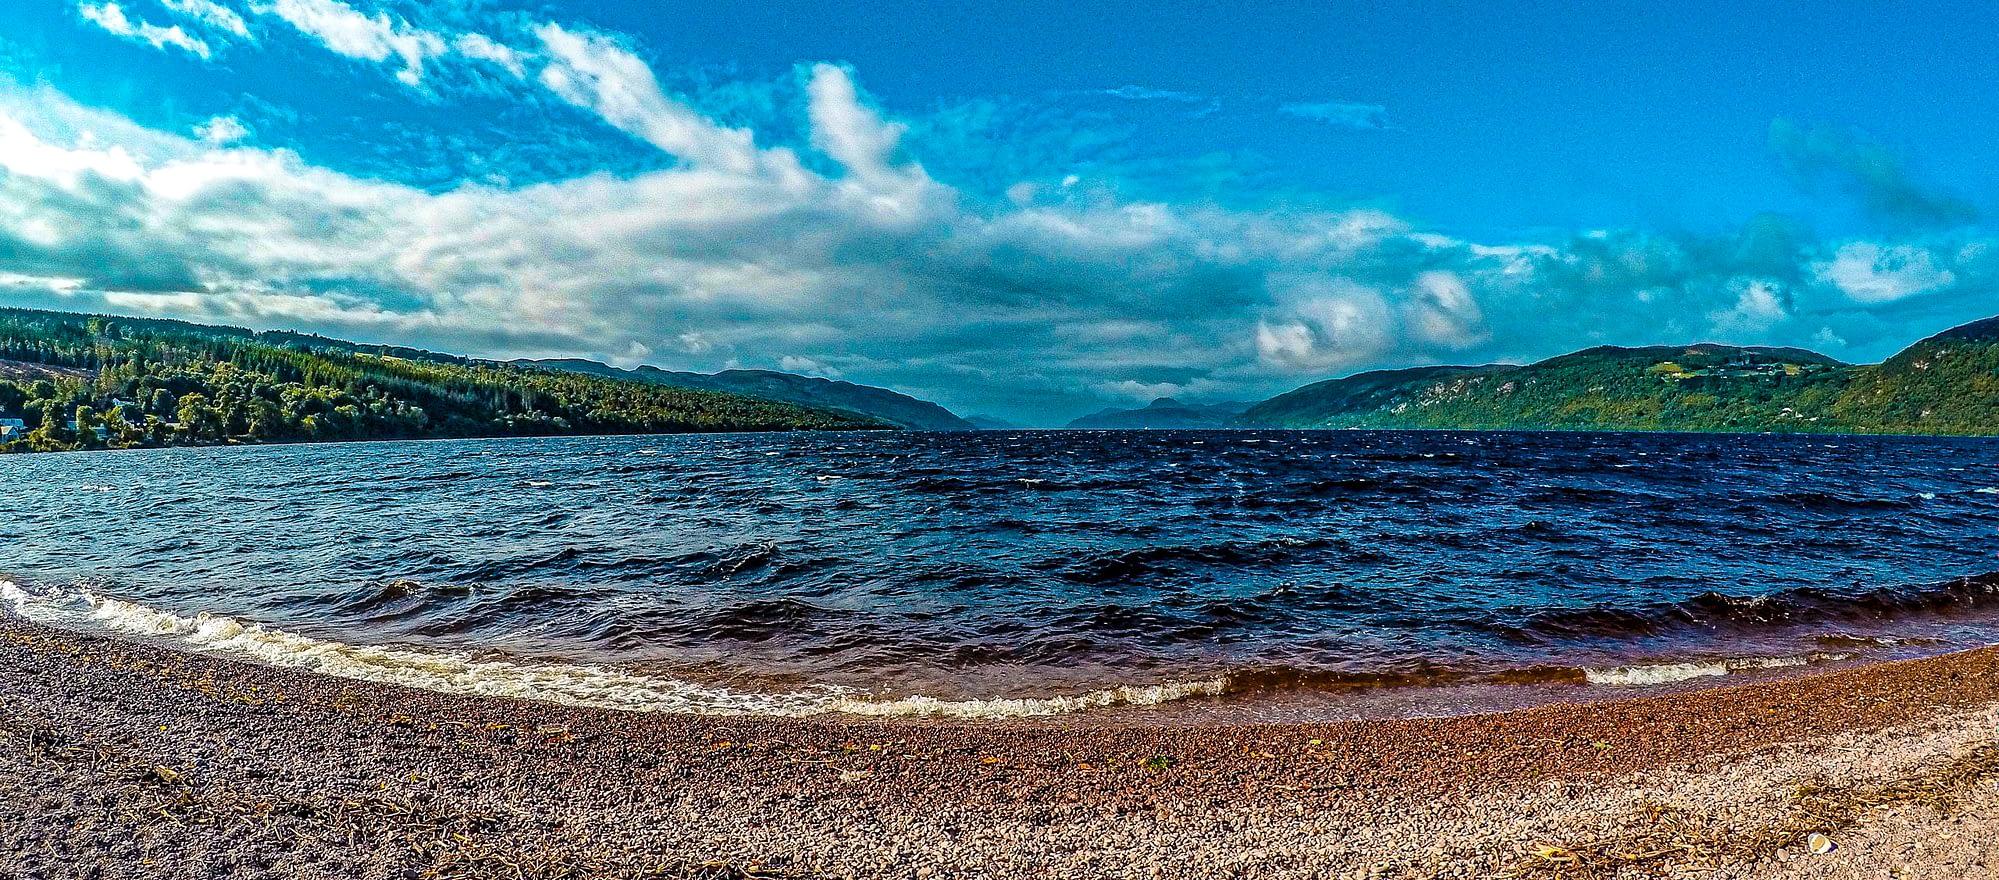 Loch Ness,Inverness, Scotland